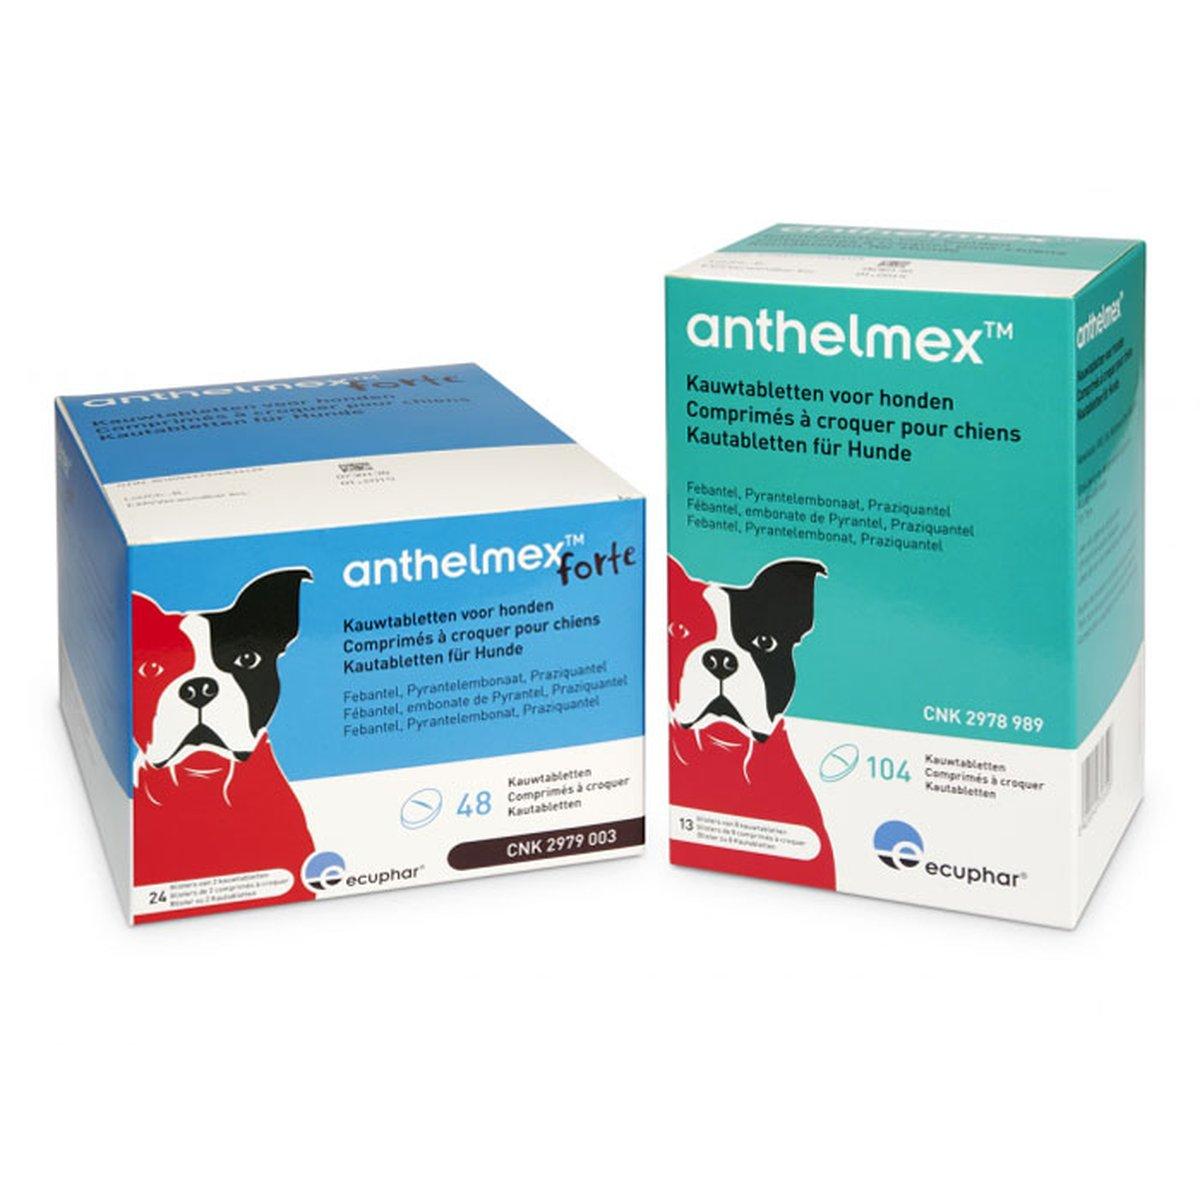 Afbeelding van Anthelmex Hond <17,5kg Kauwtabletten Kennelverpakking 104st